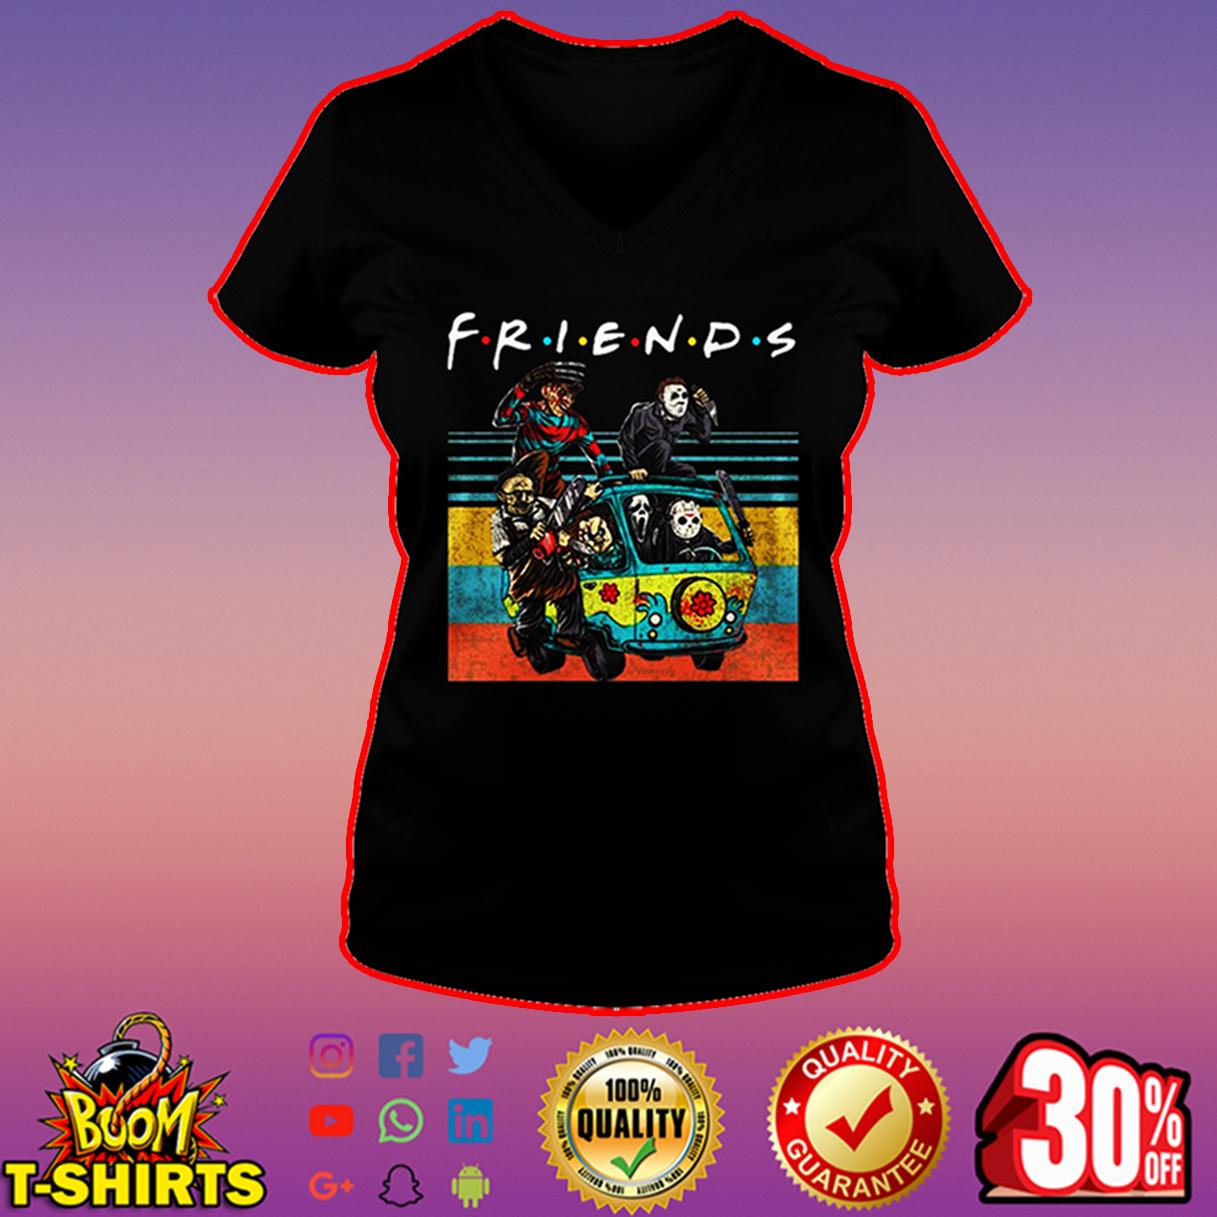 Freddy Krueger Michael Myers Leatherface Chucky Ghostface Jason Voorhees friends v-neck